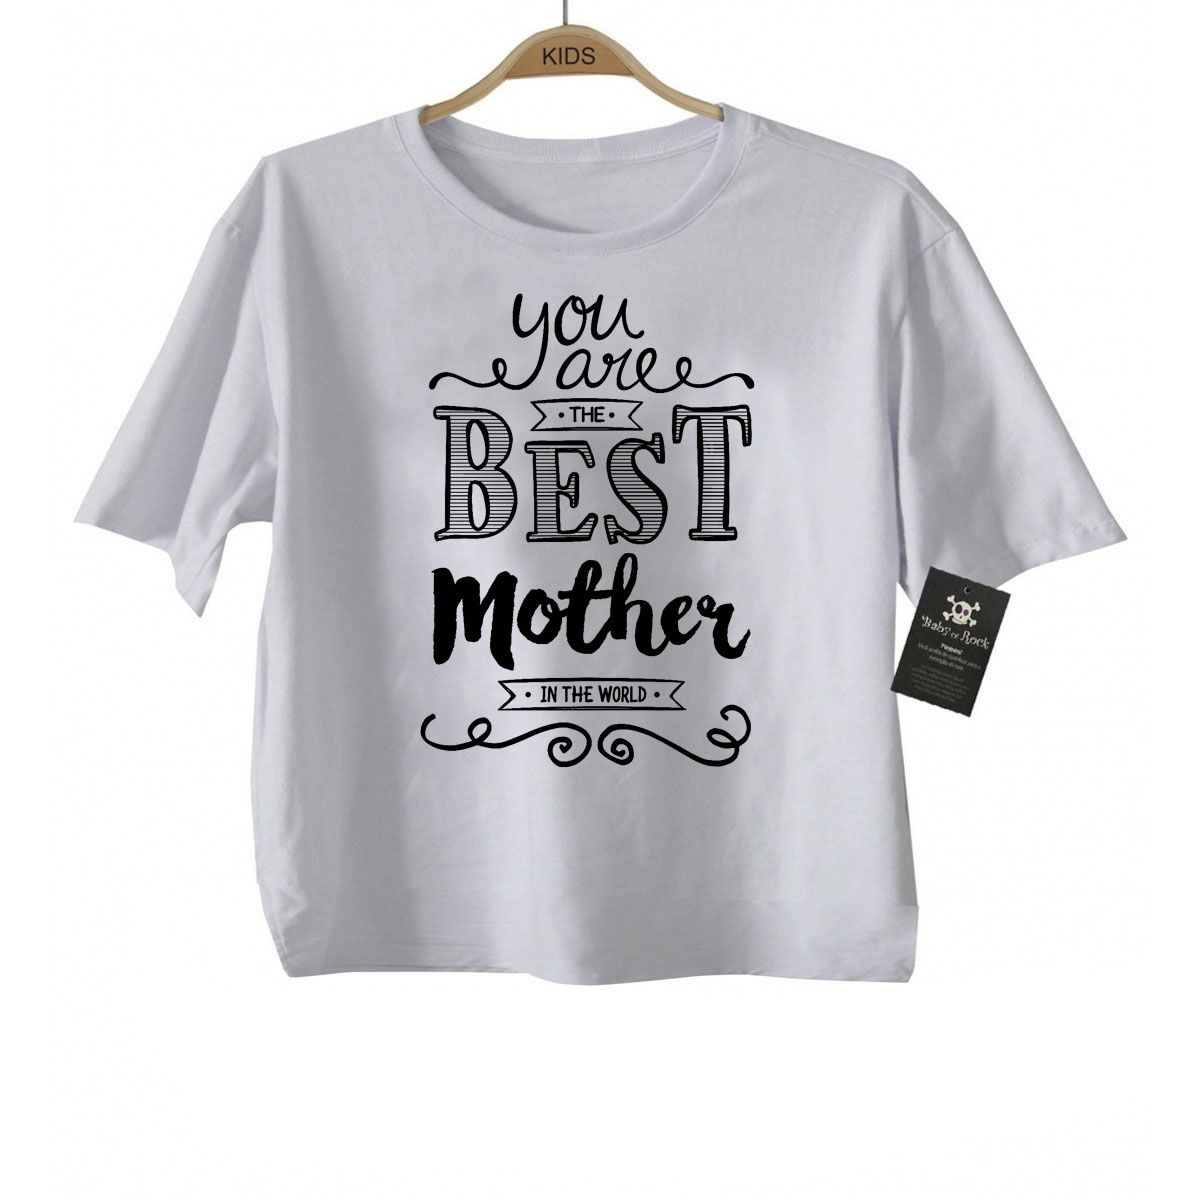 Camiseta Infantil A Melhor Mãe do Mundo- White  - Baby Monster - Body Bebe